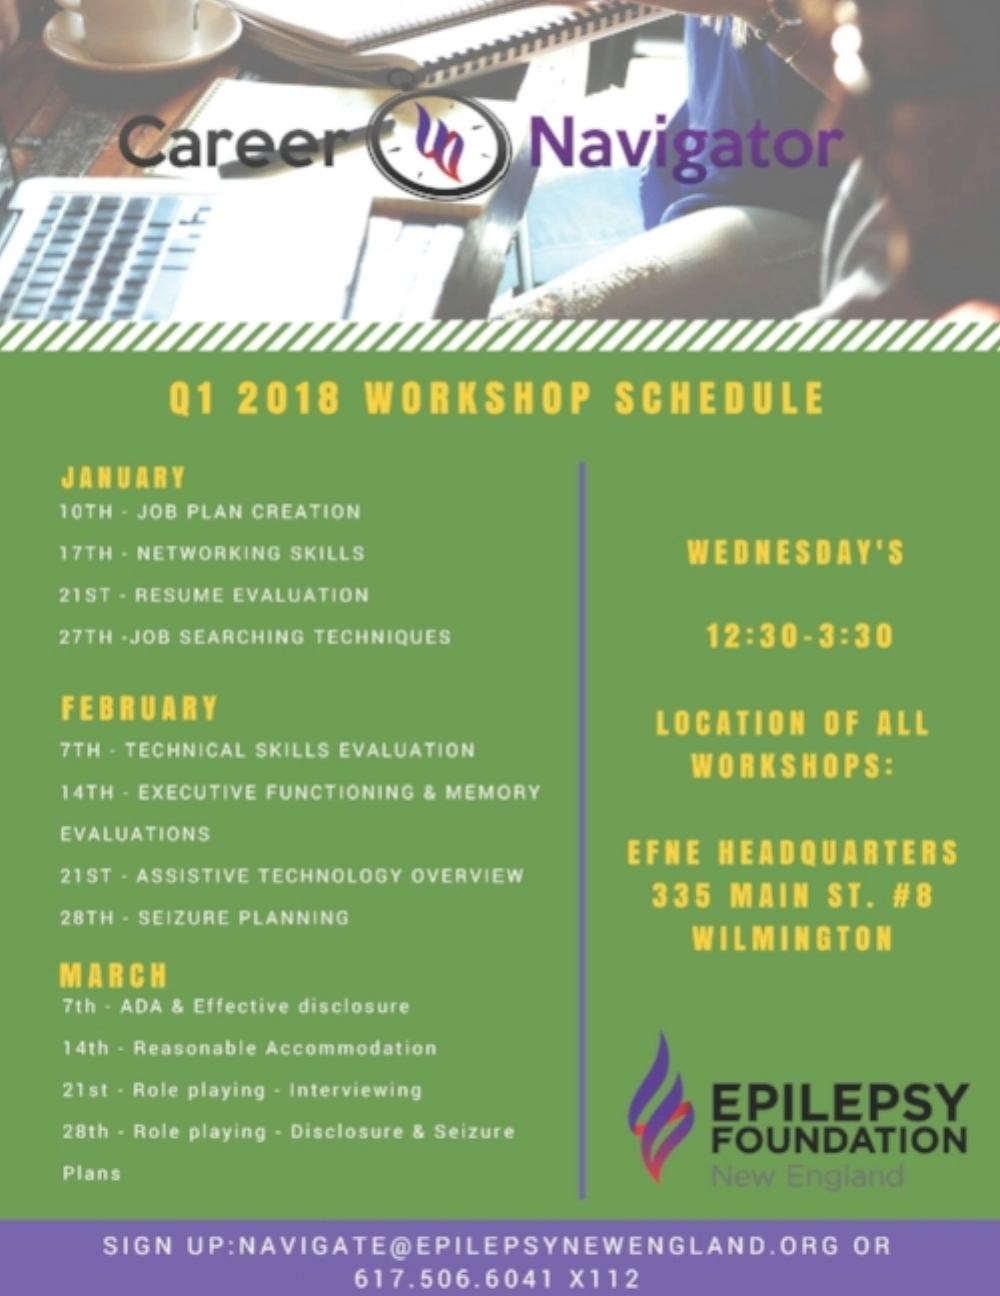 Poster - 2018 Career Navigator Workshop Schedule.jpg